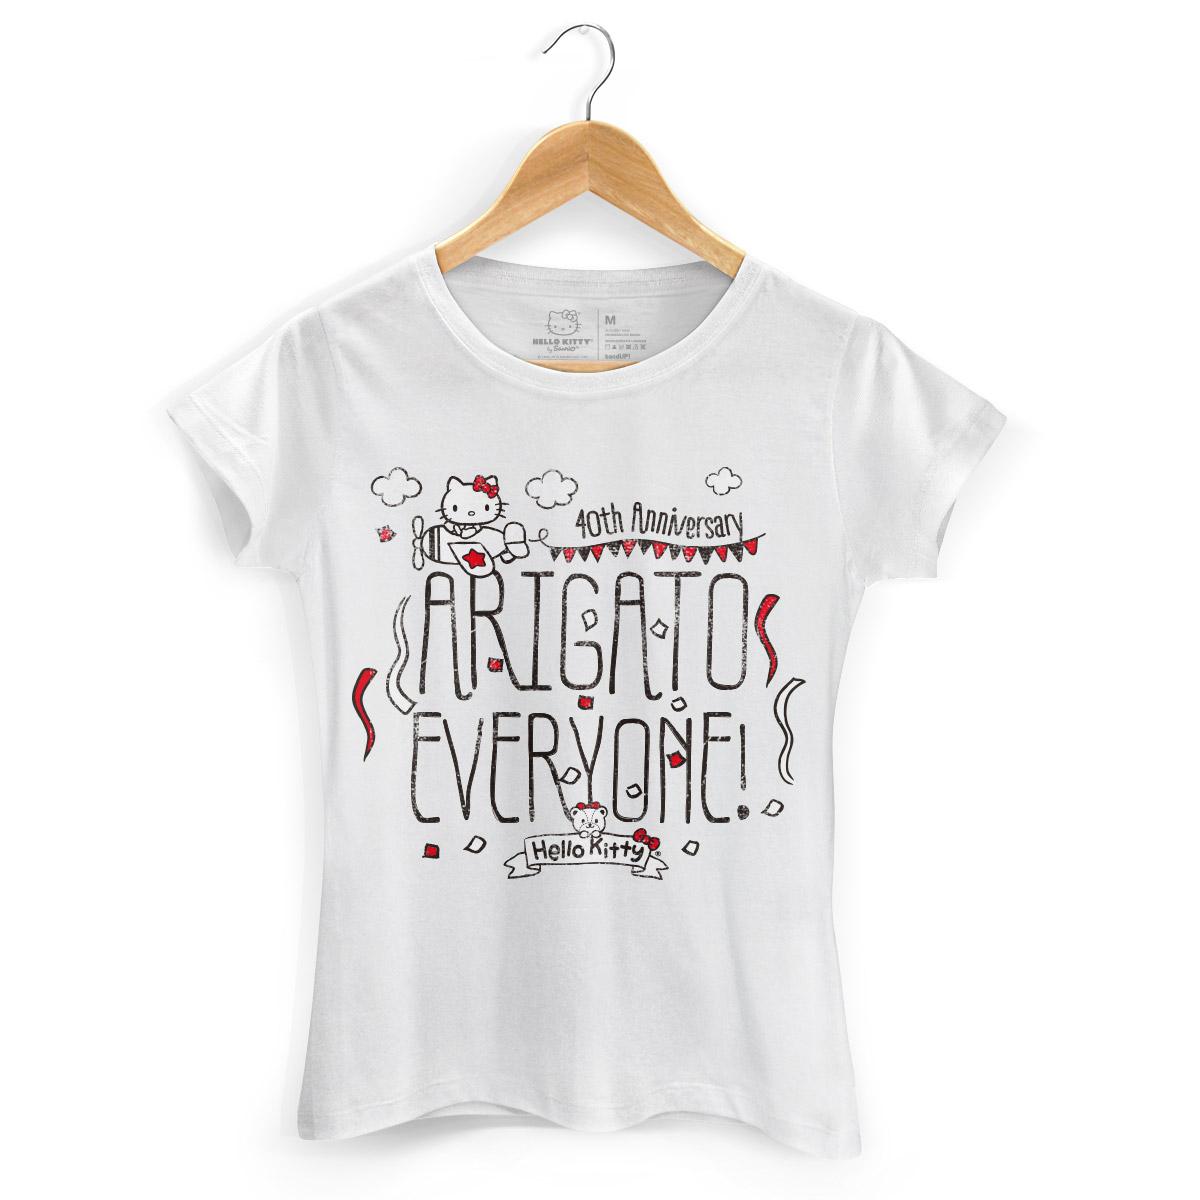 Camiseta Hello Kitty Arigato Everyone